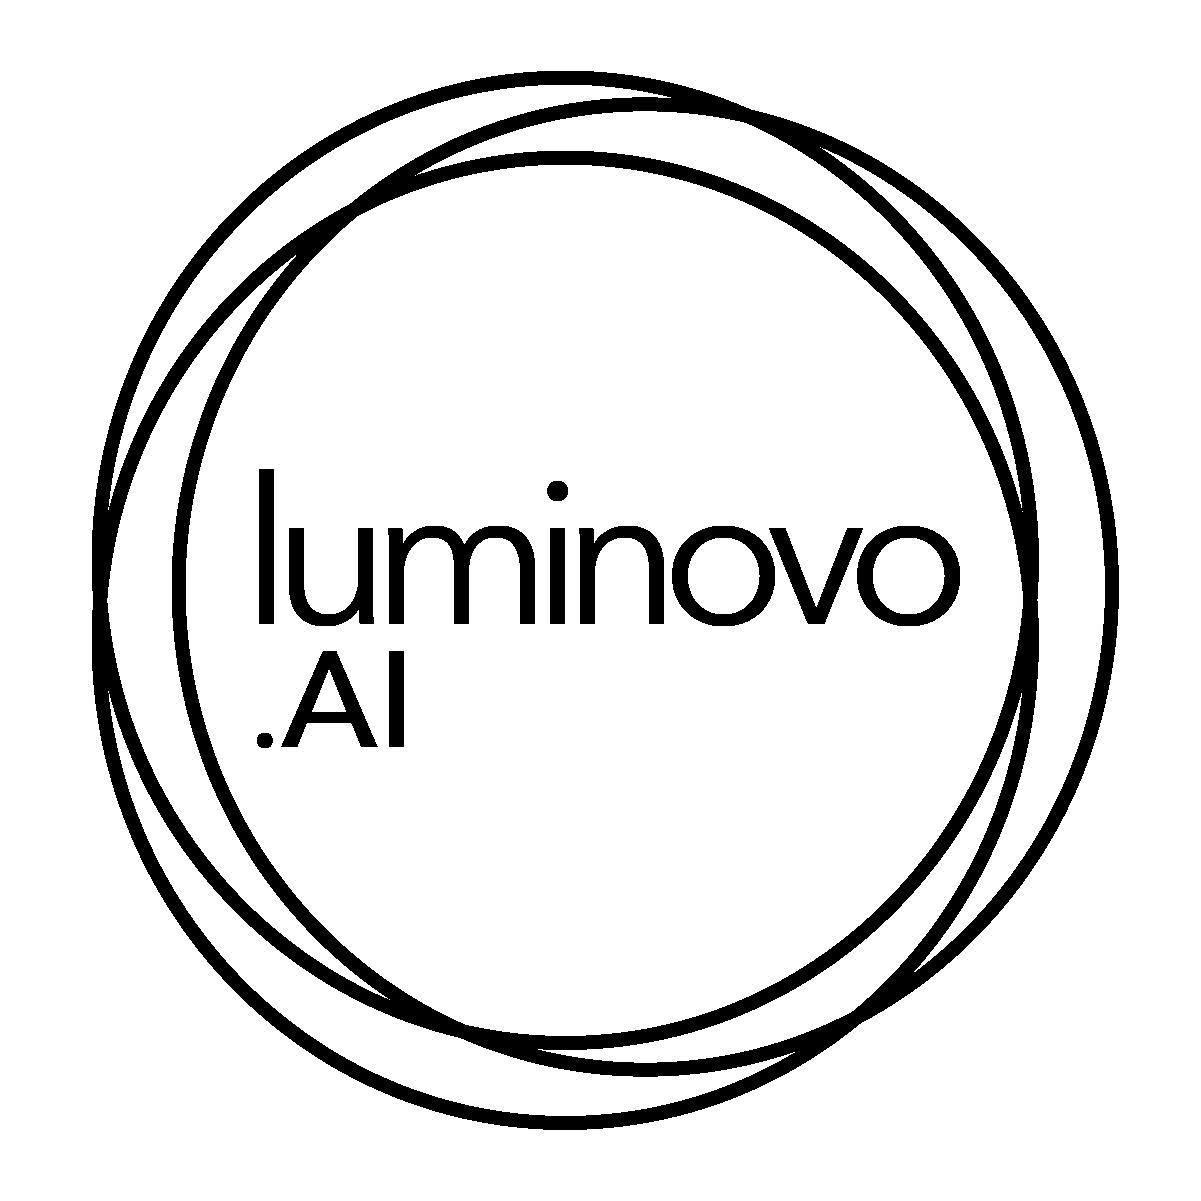 Luminovo Artificial Intelligence GmbH